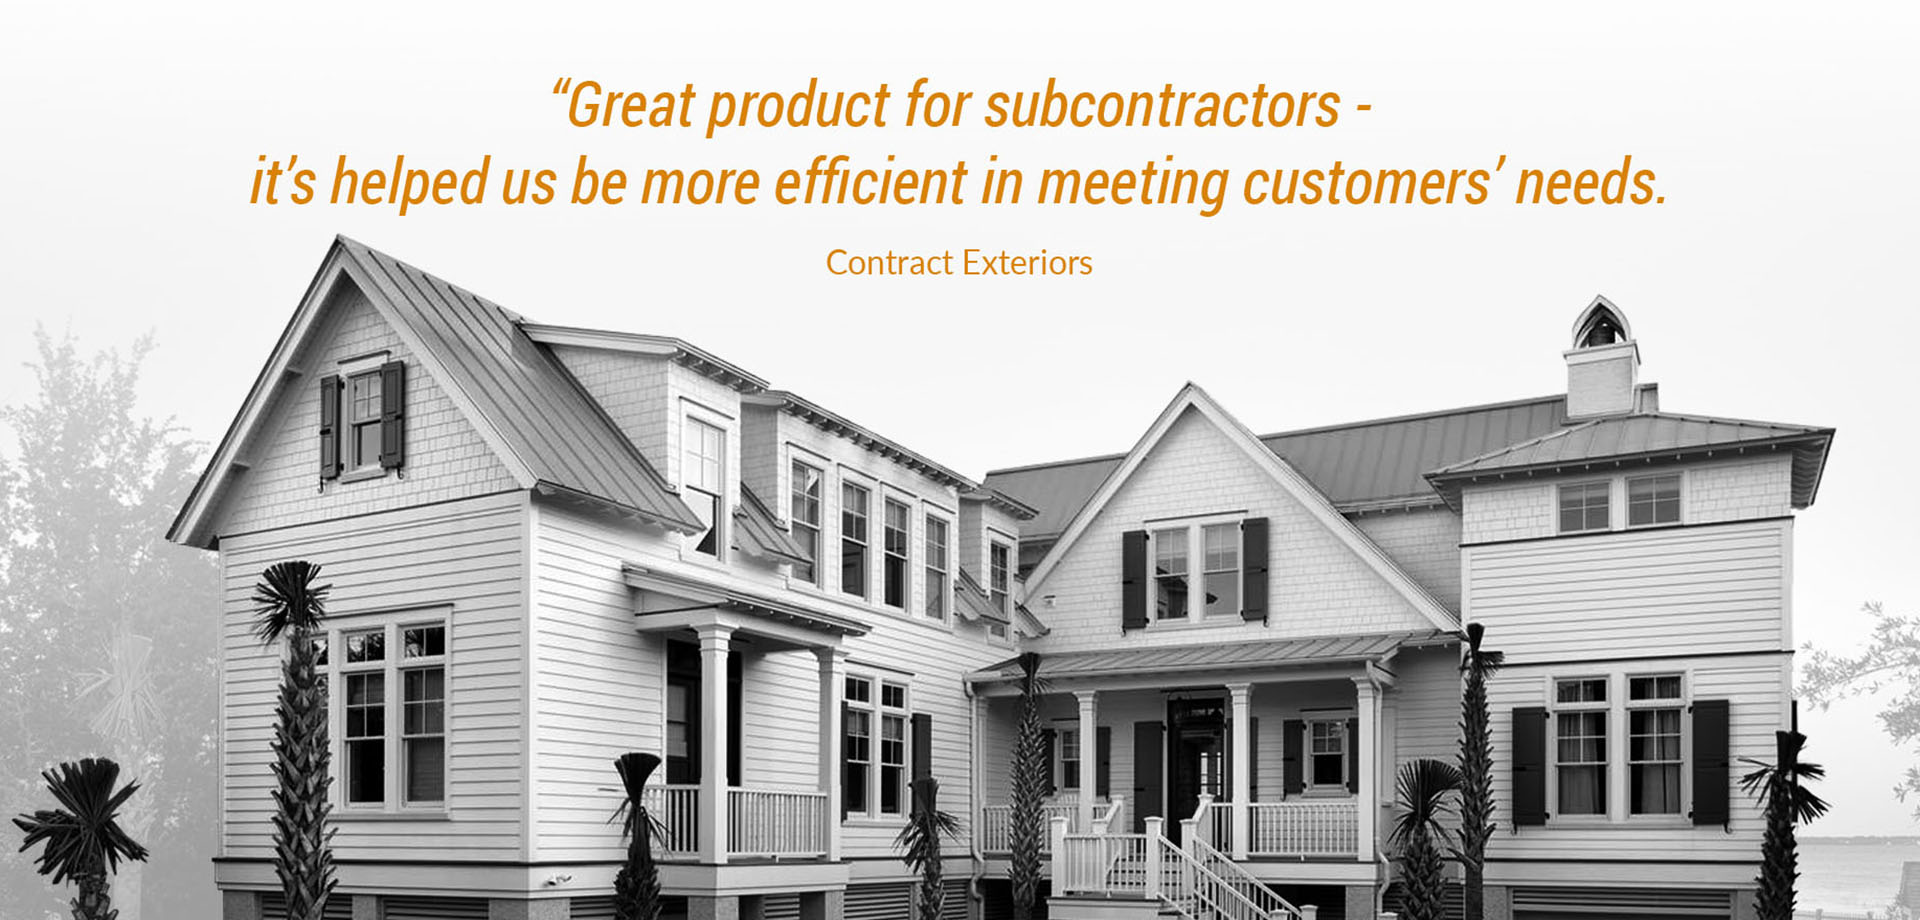 cm-contract_exteriors.jpg